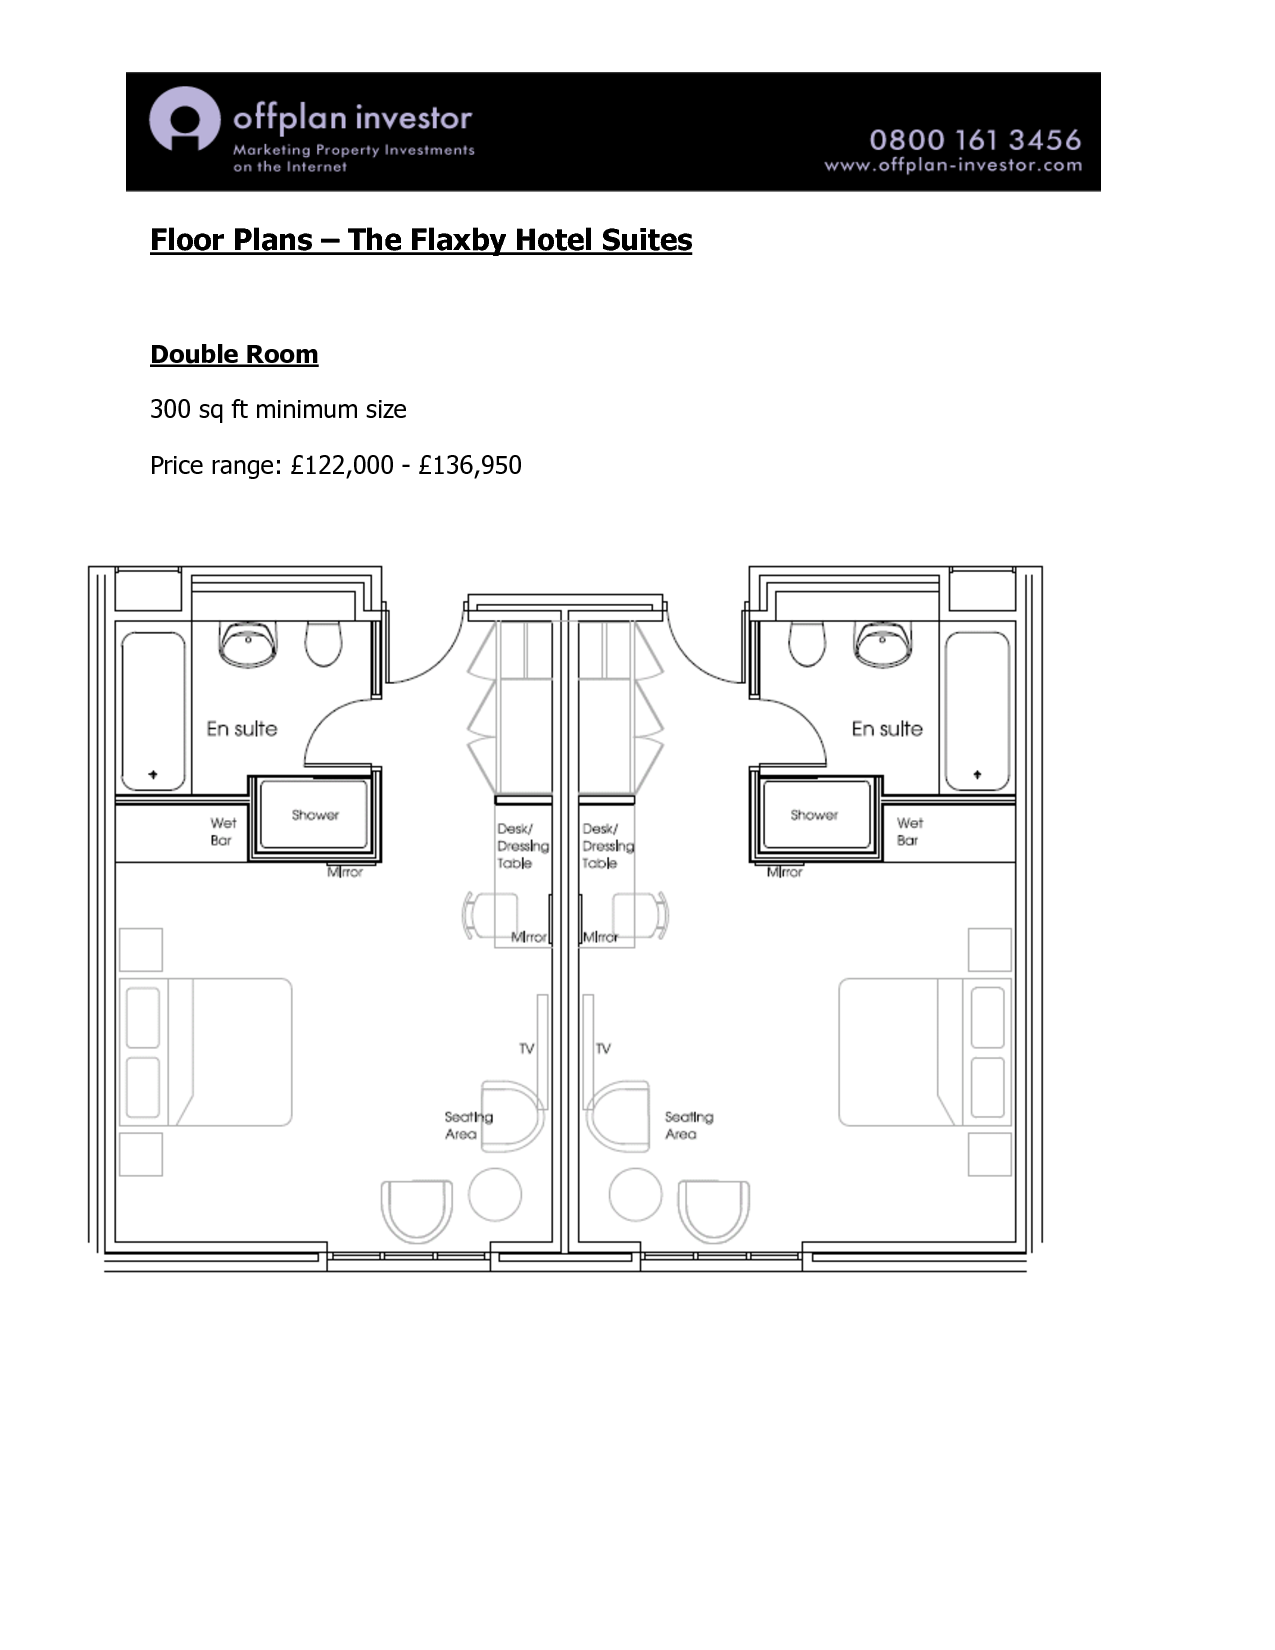 Hotel Room Floor Plans Floor Plans The Flaxby Hotel Suites